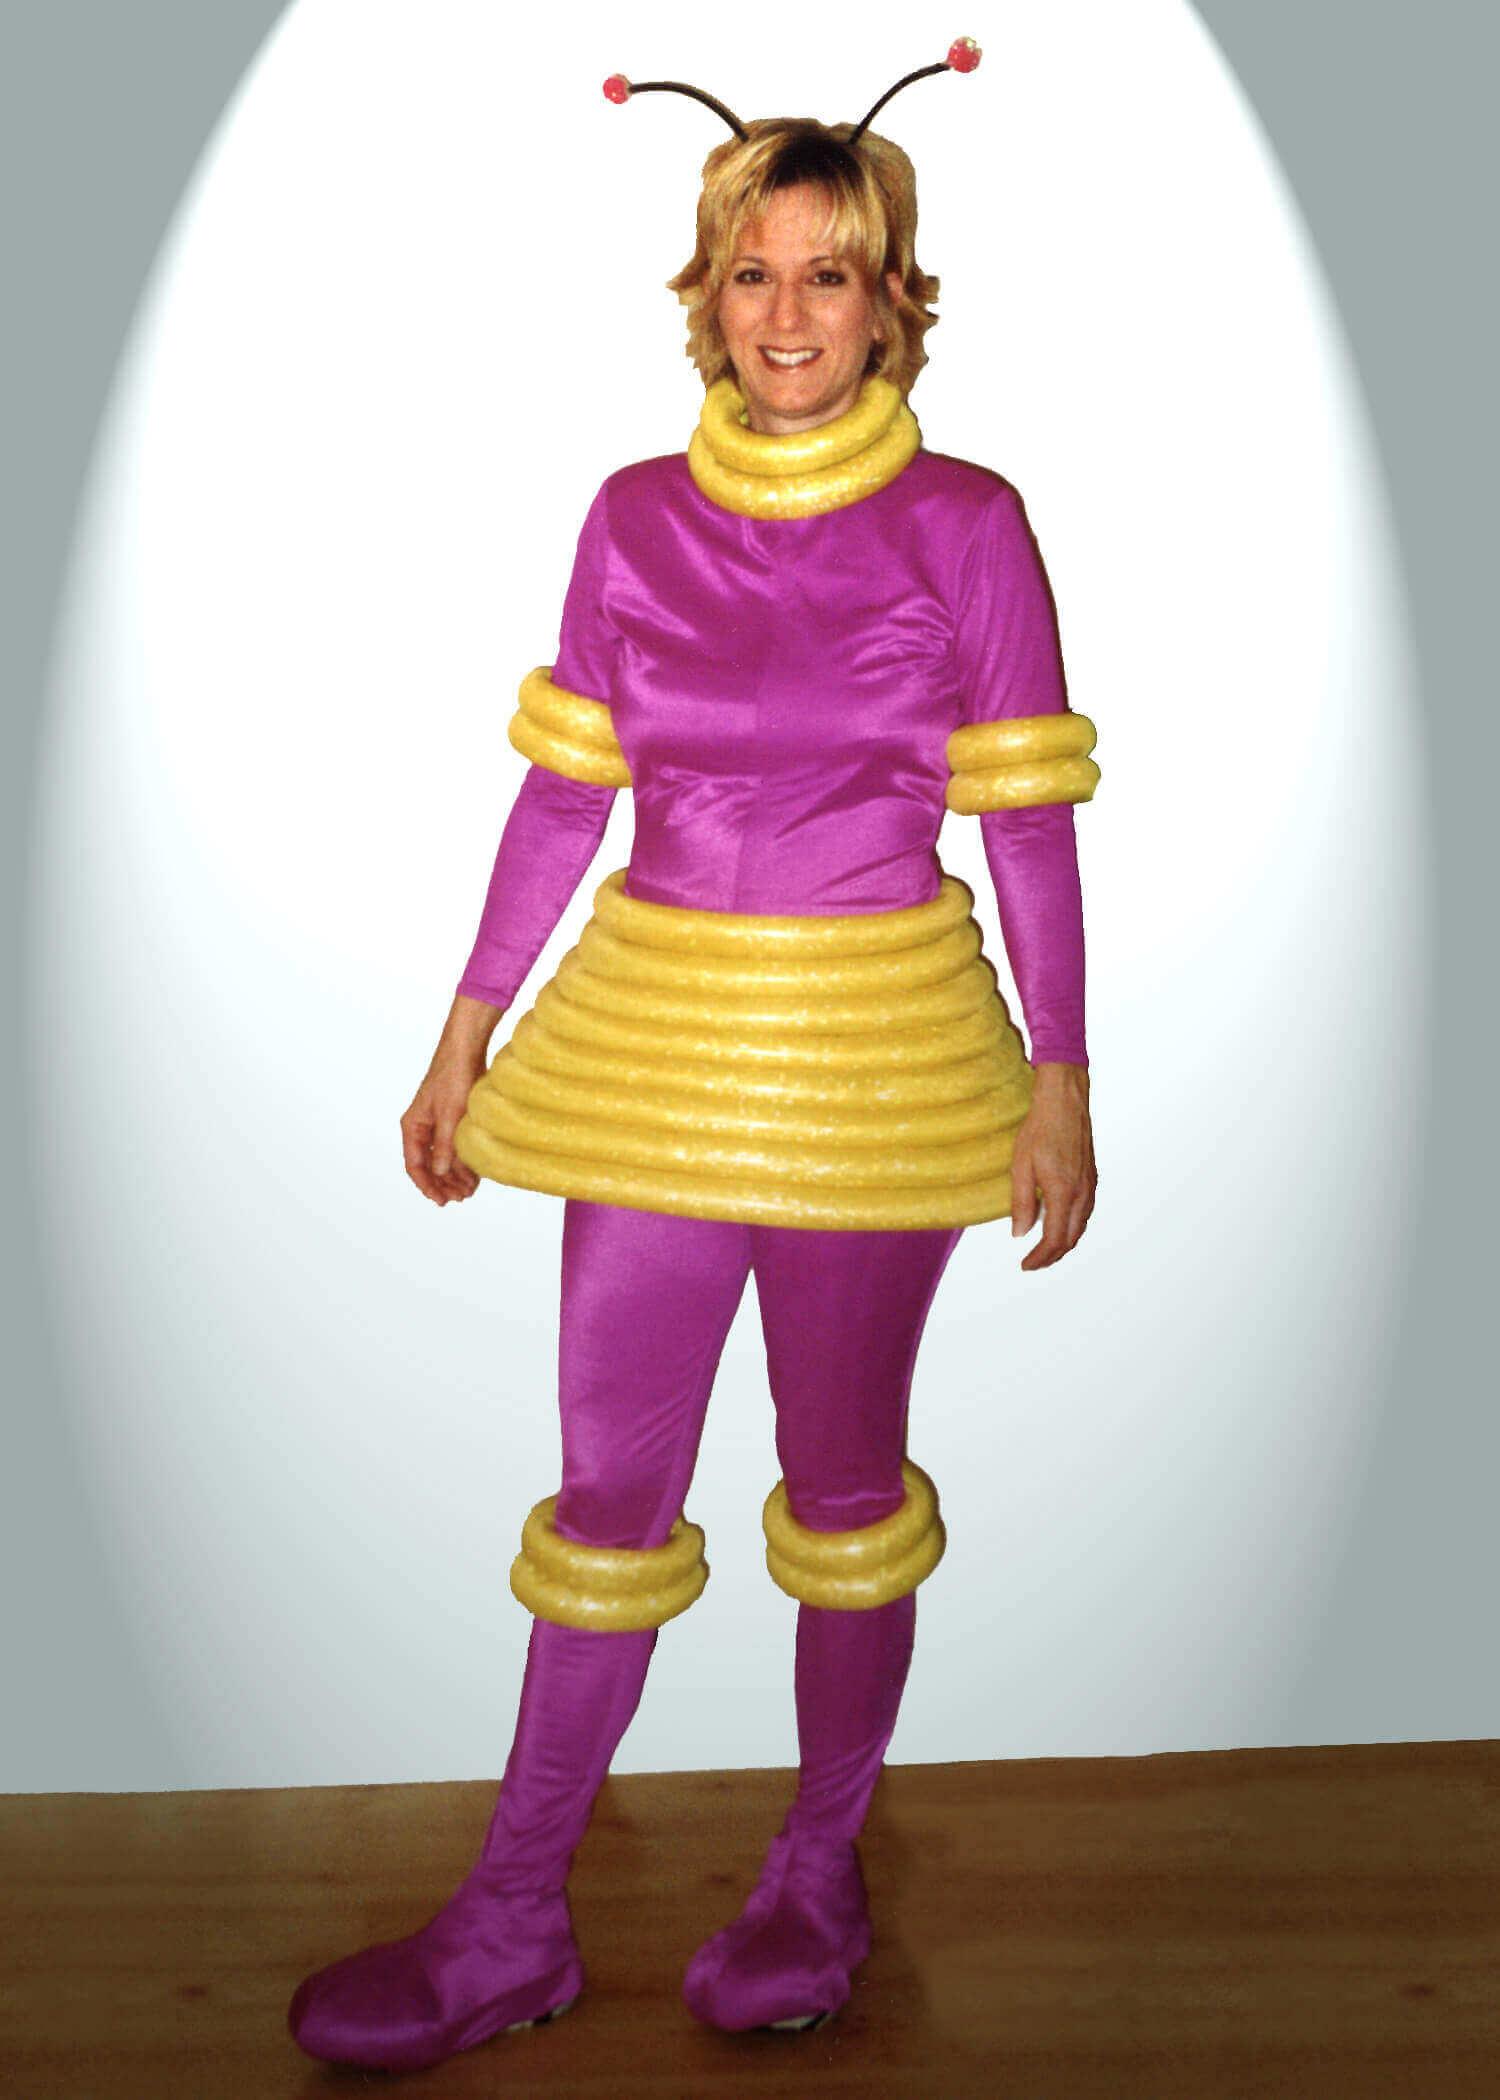 Kids TV Show Costume by Rebecca Wendlandt: Blitz from Blop